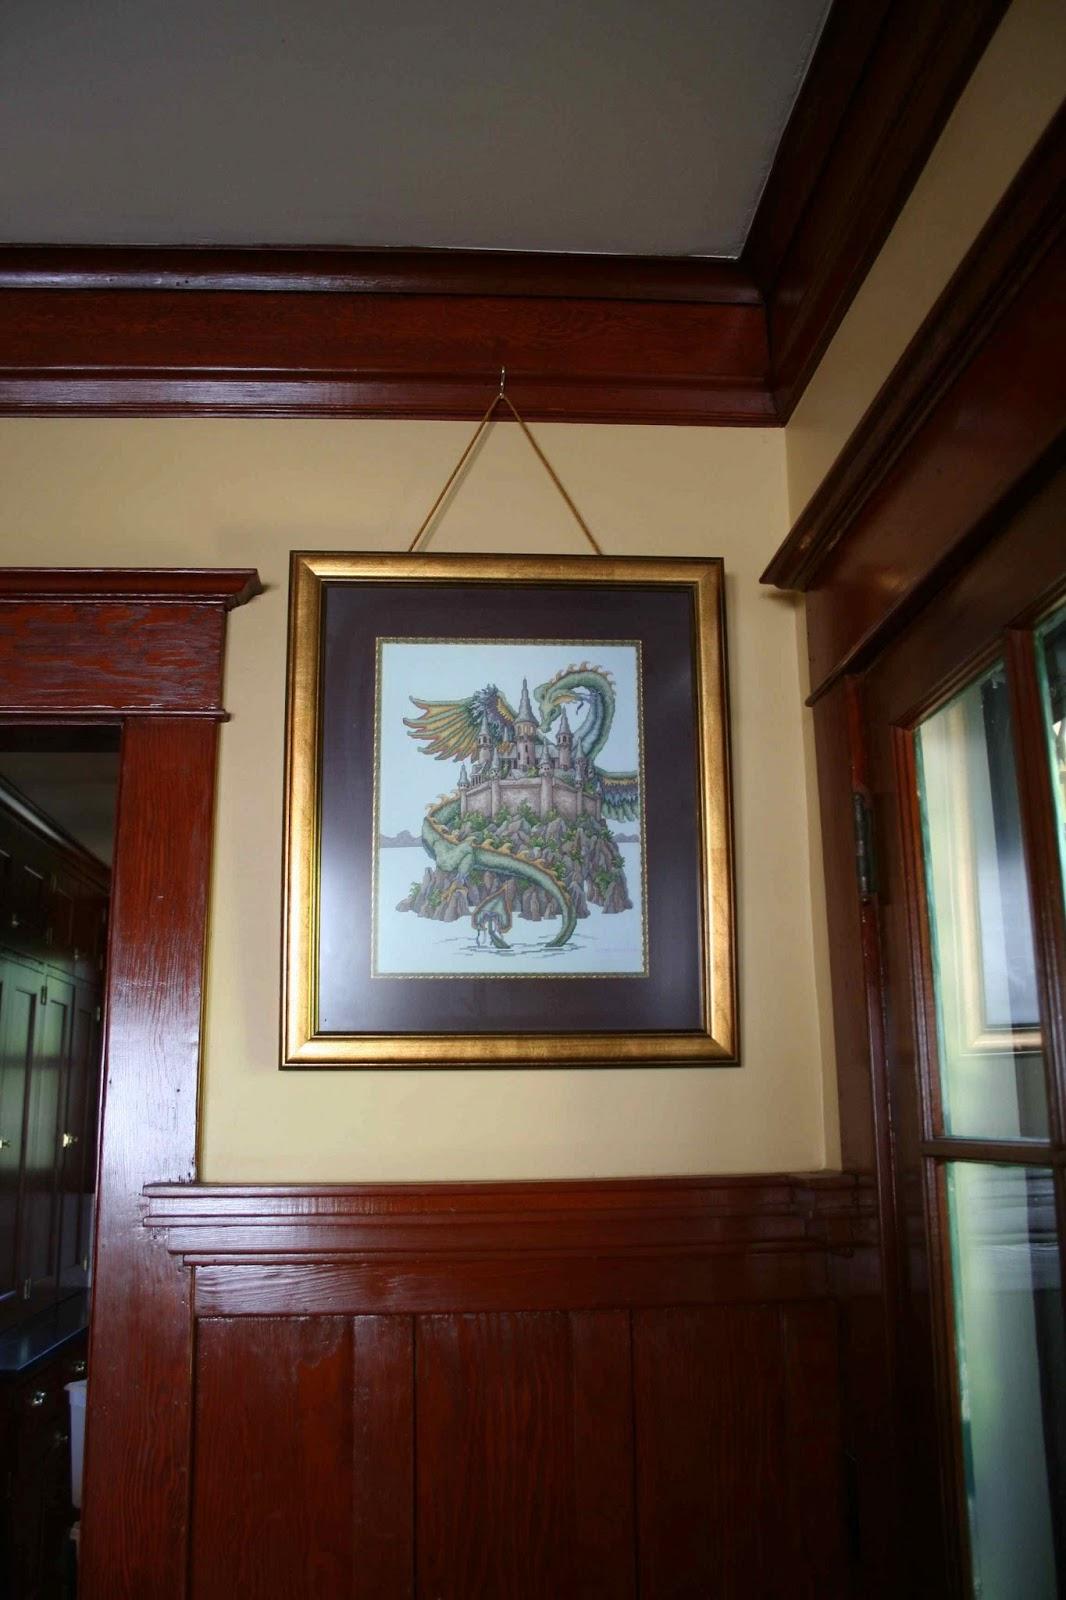 Laurelhurst craftsman bungalow picture hanging adventures for Craftsman picture rail